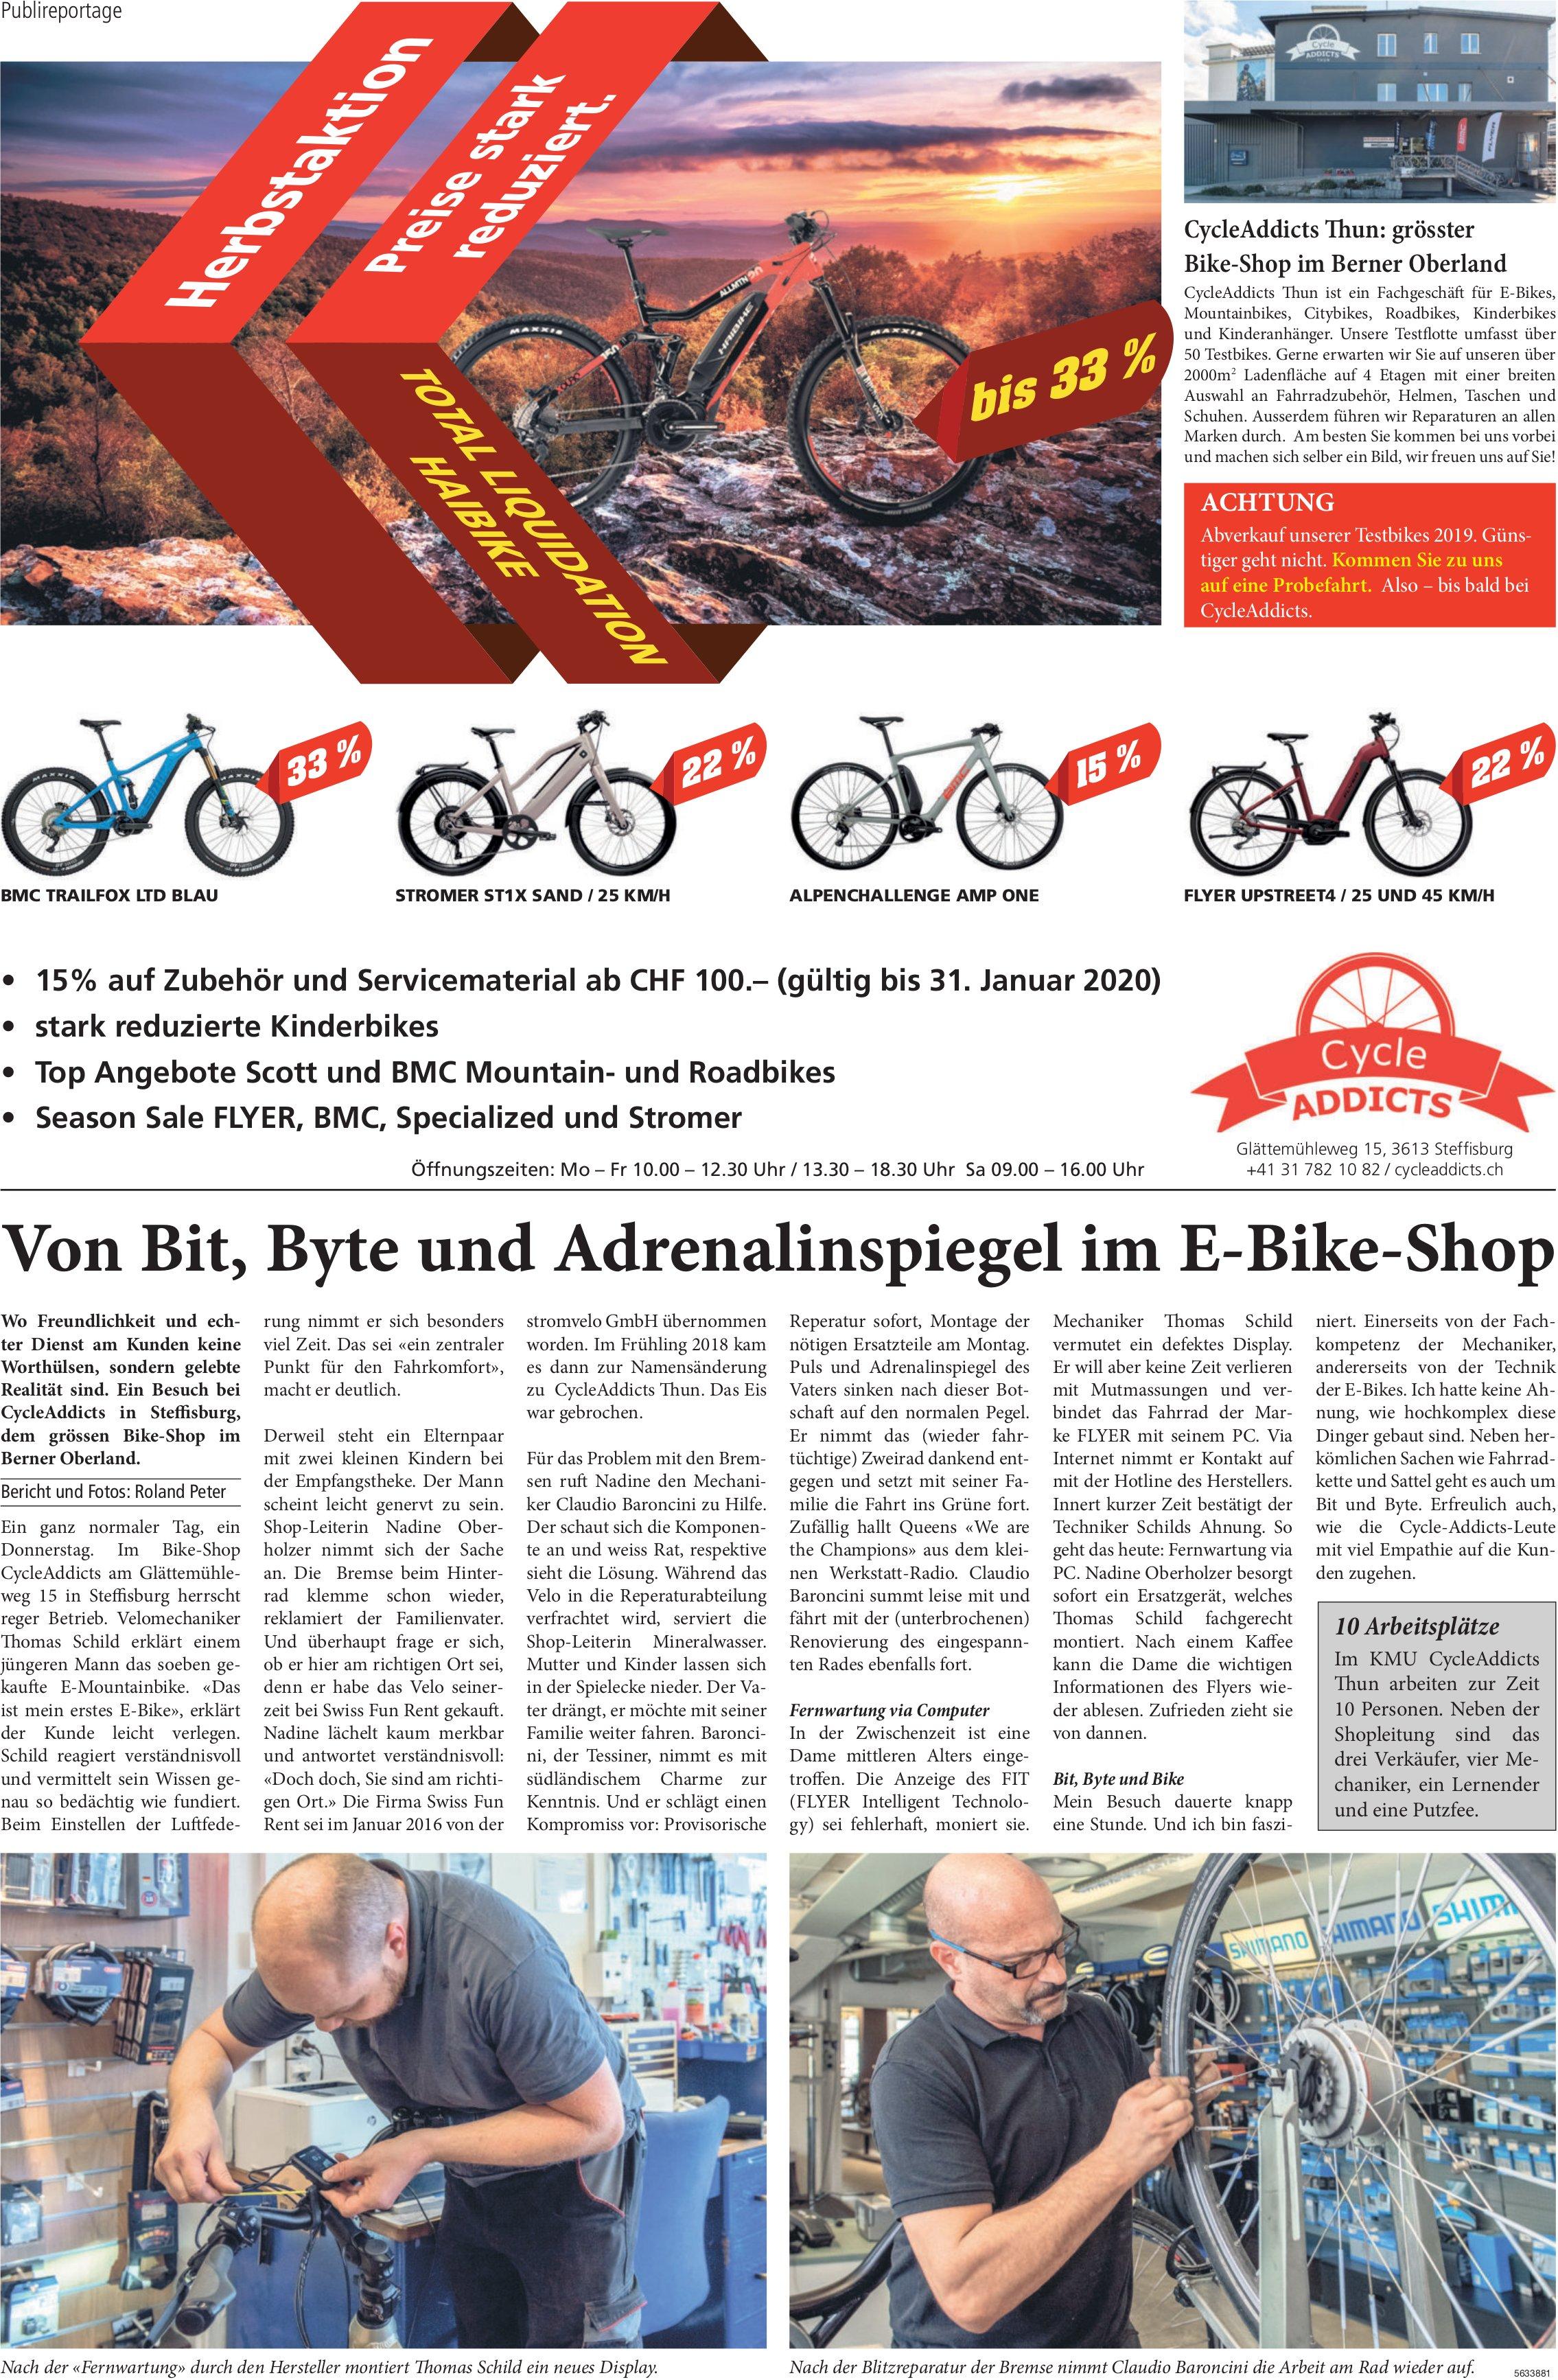 Cycle Addicts - Herbstaktion,  Preise stark reduziert